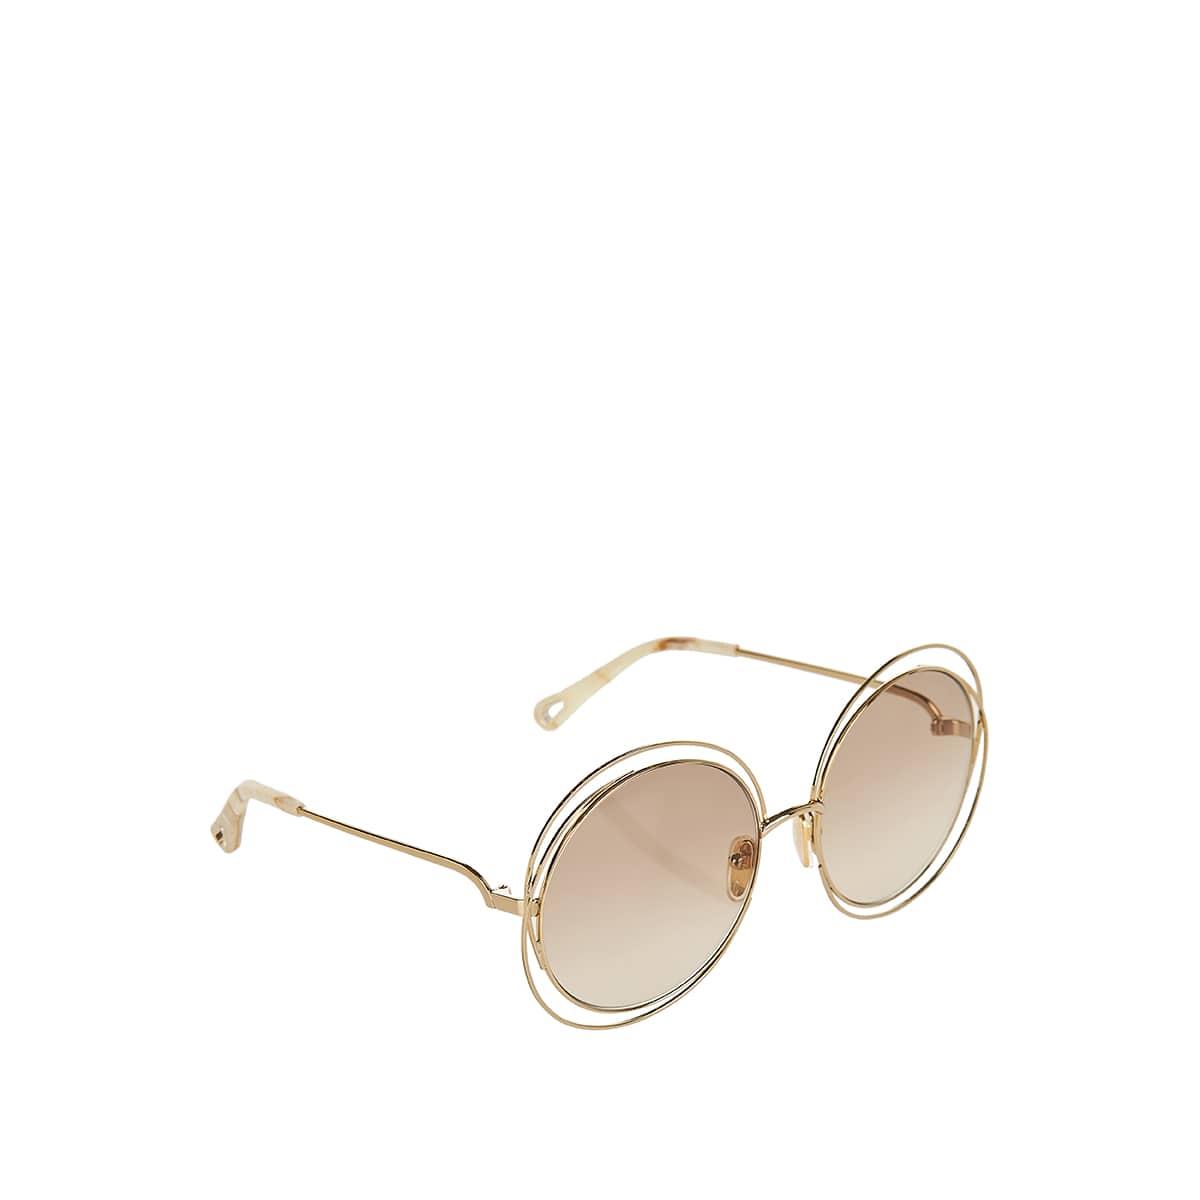 Oversized round metal sunglasses